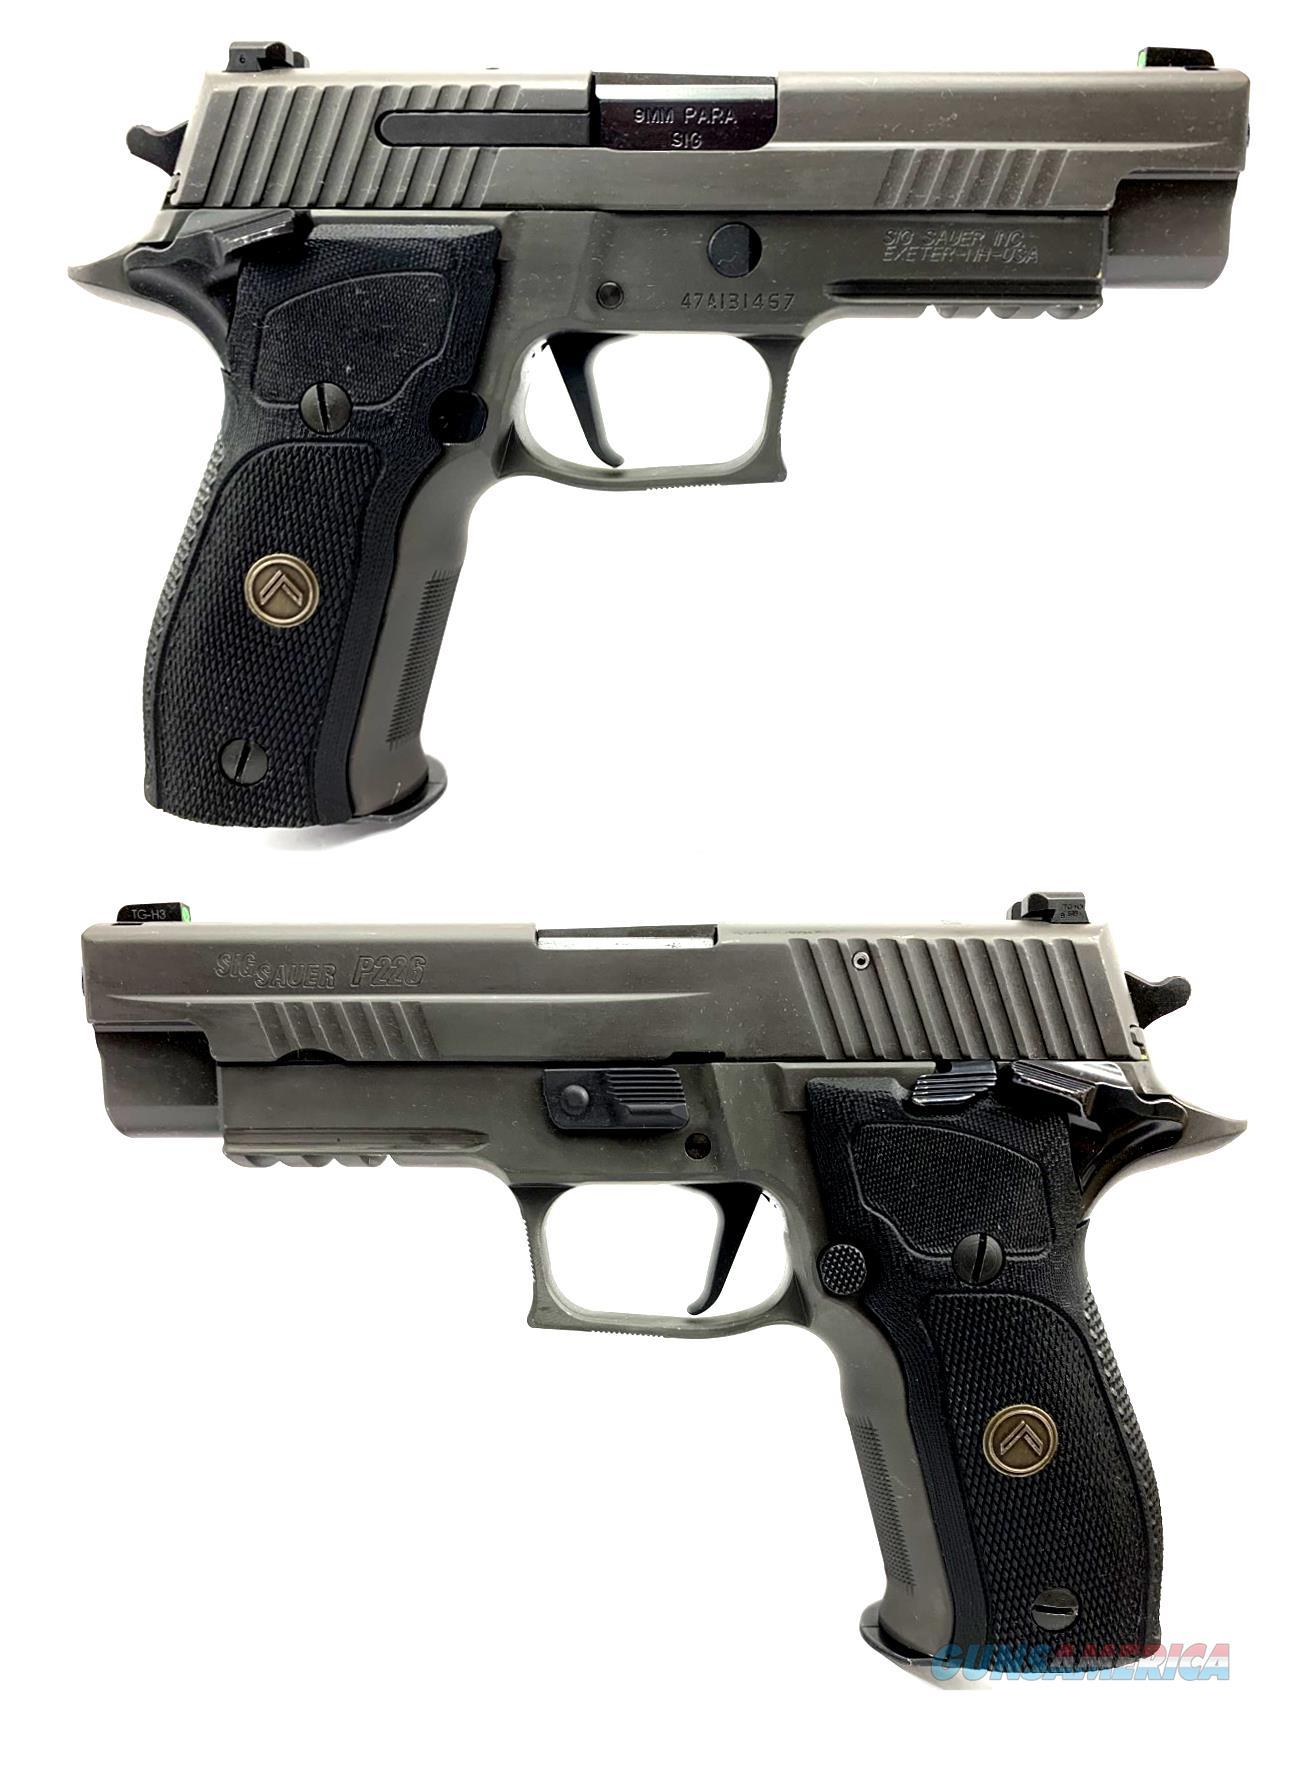 Sig Sauer P226 Legion 9MM Semi-Automatic Pistol  Guns > Pistols > Sig - Sauer/Sigarms Pistols > P226